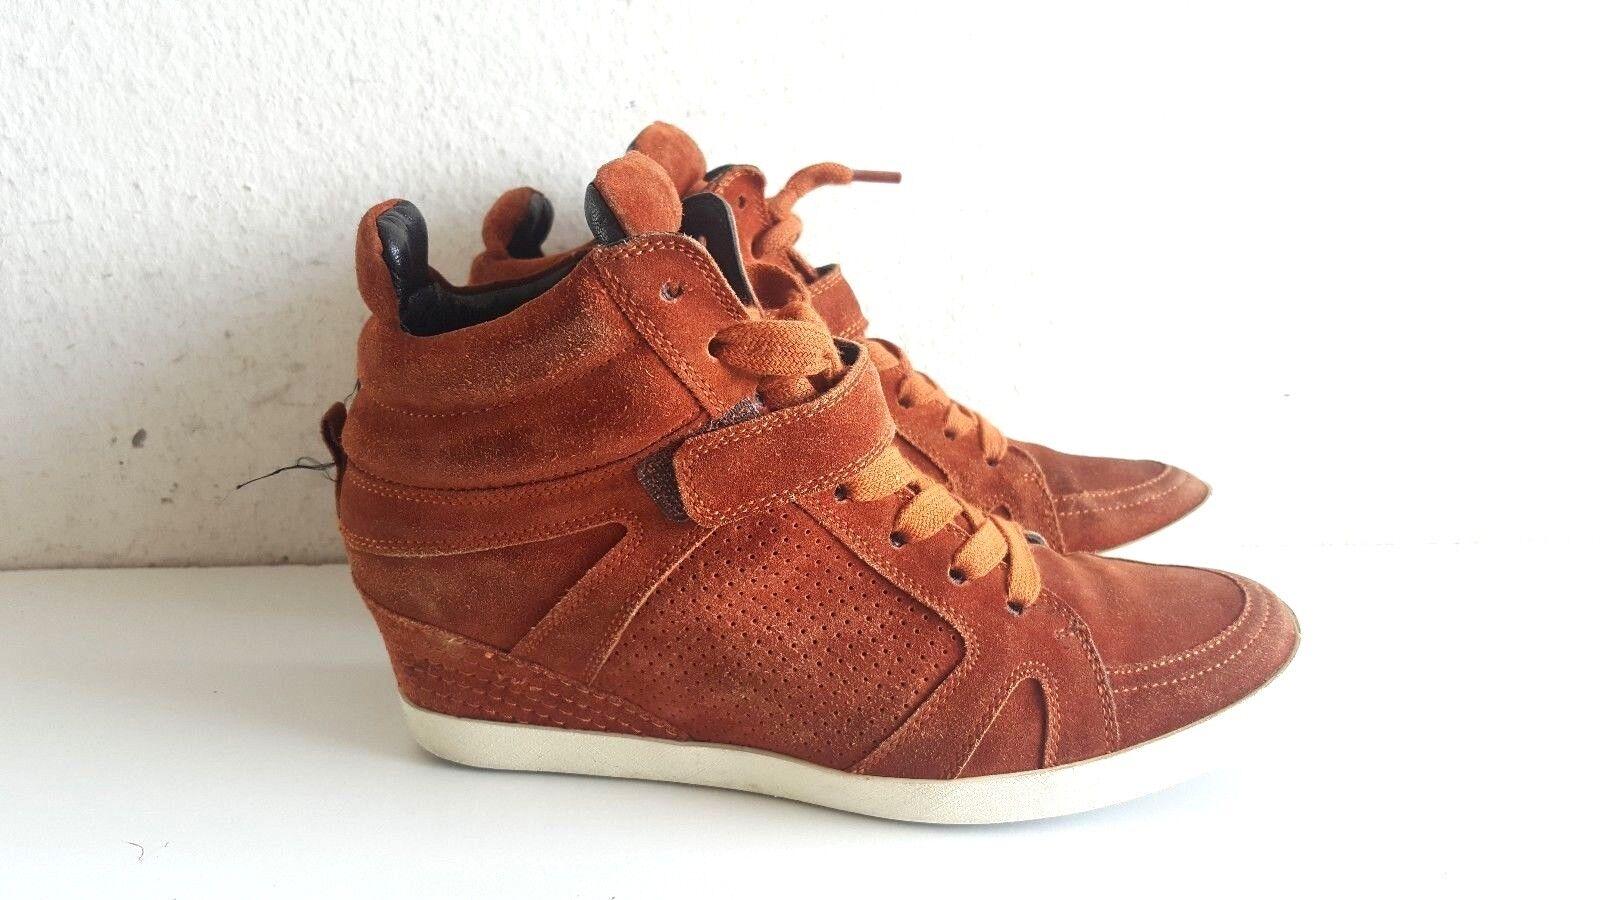 Kennel Gr.39 Schmenger SneakerBoots Stiefel echtleder Gr.39 Kennel UK 6 TOP Zustand 8de5b1